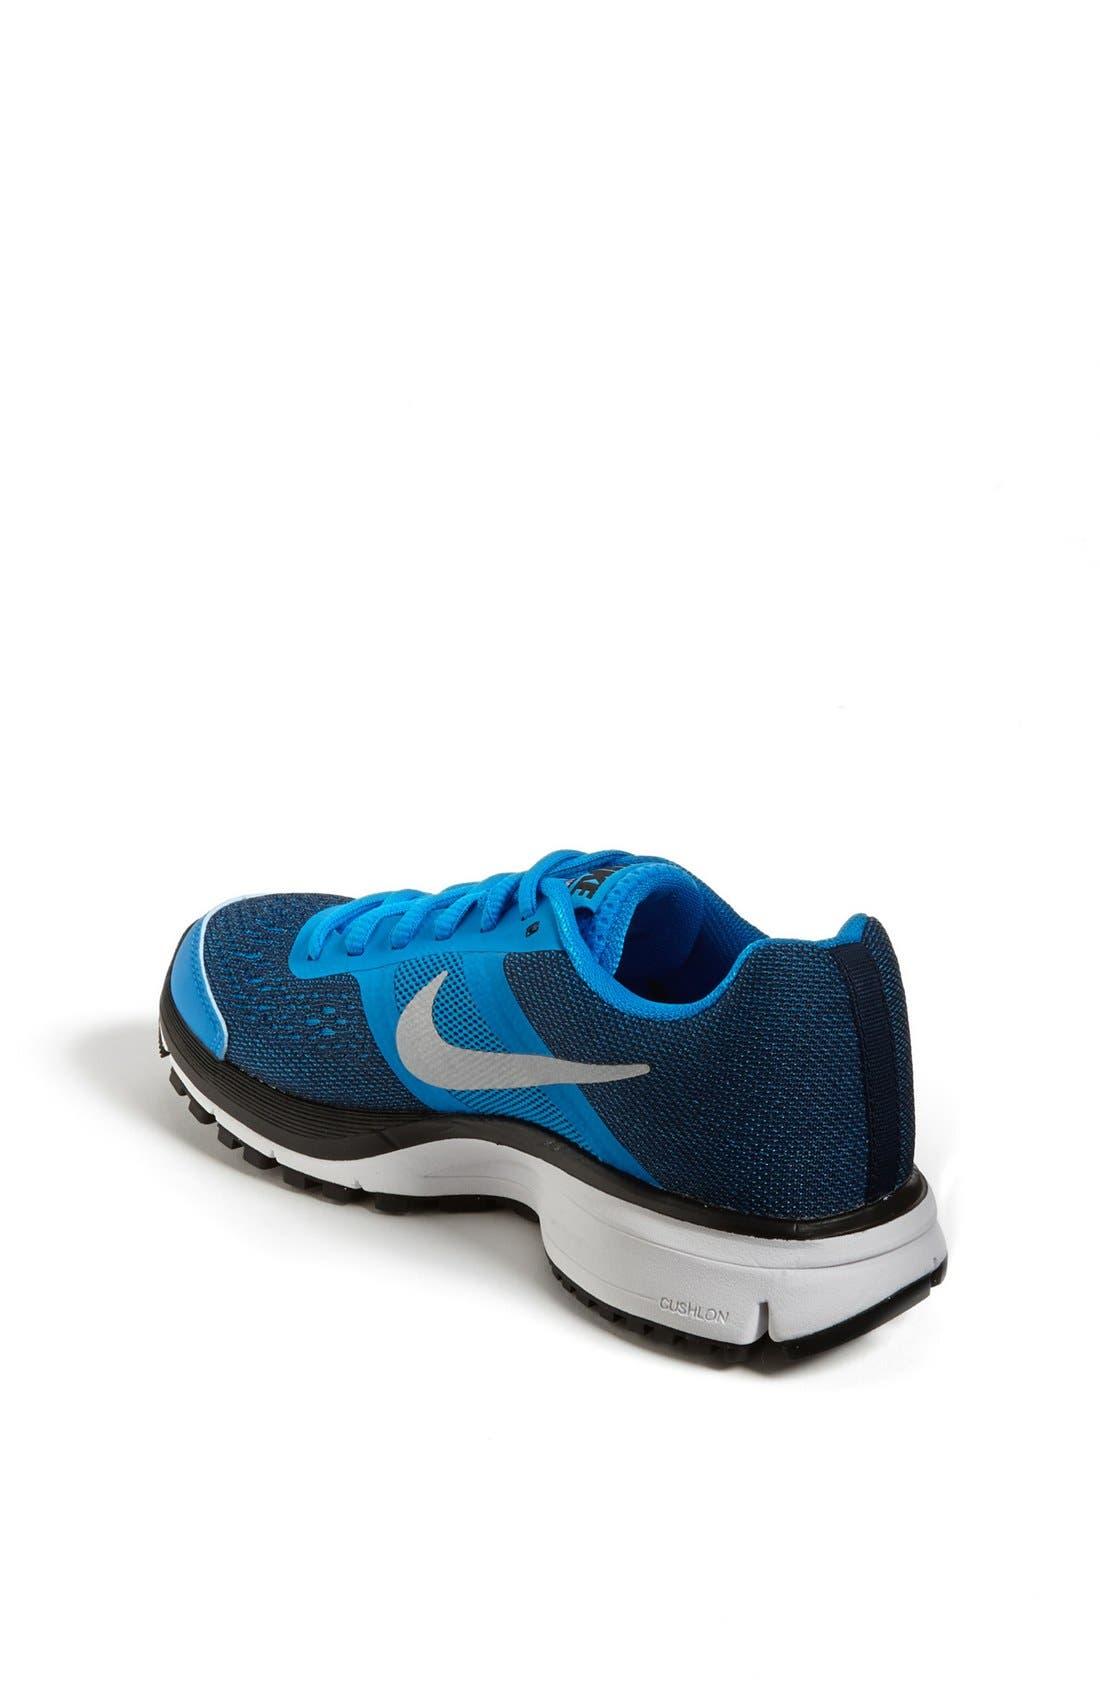 Alternate Image 2  - Nike 'Air Pegasus+ 30 GS' Running Shoe (Little Kid & Big Kid)